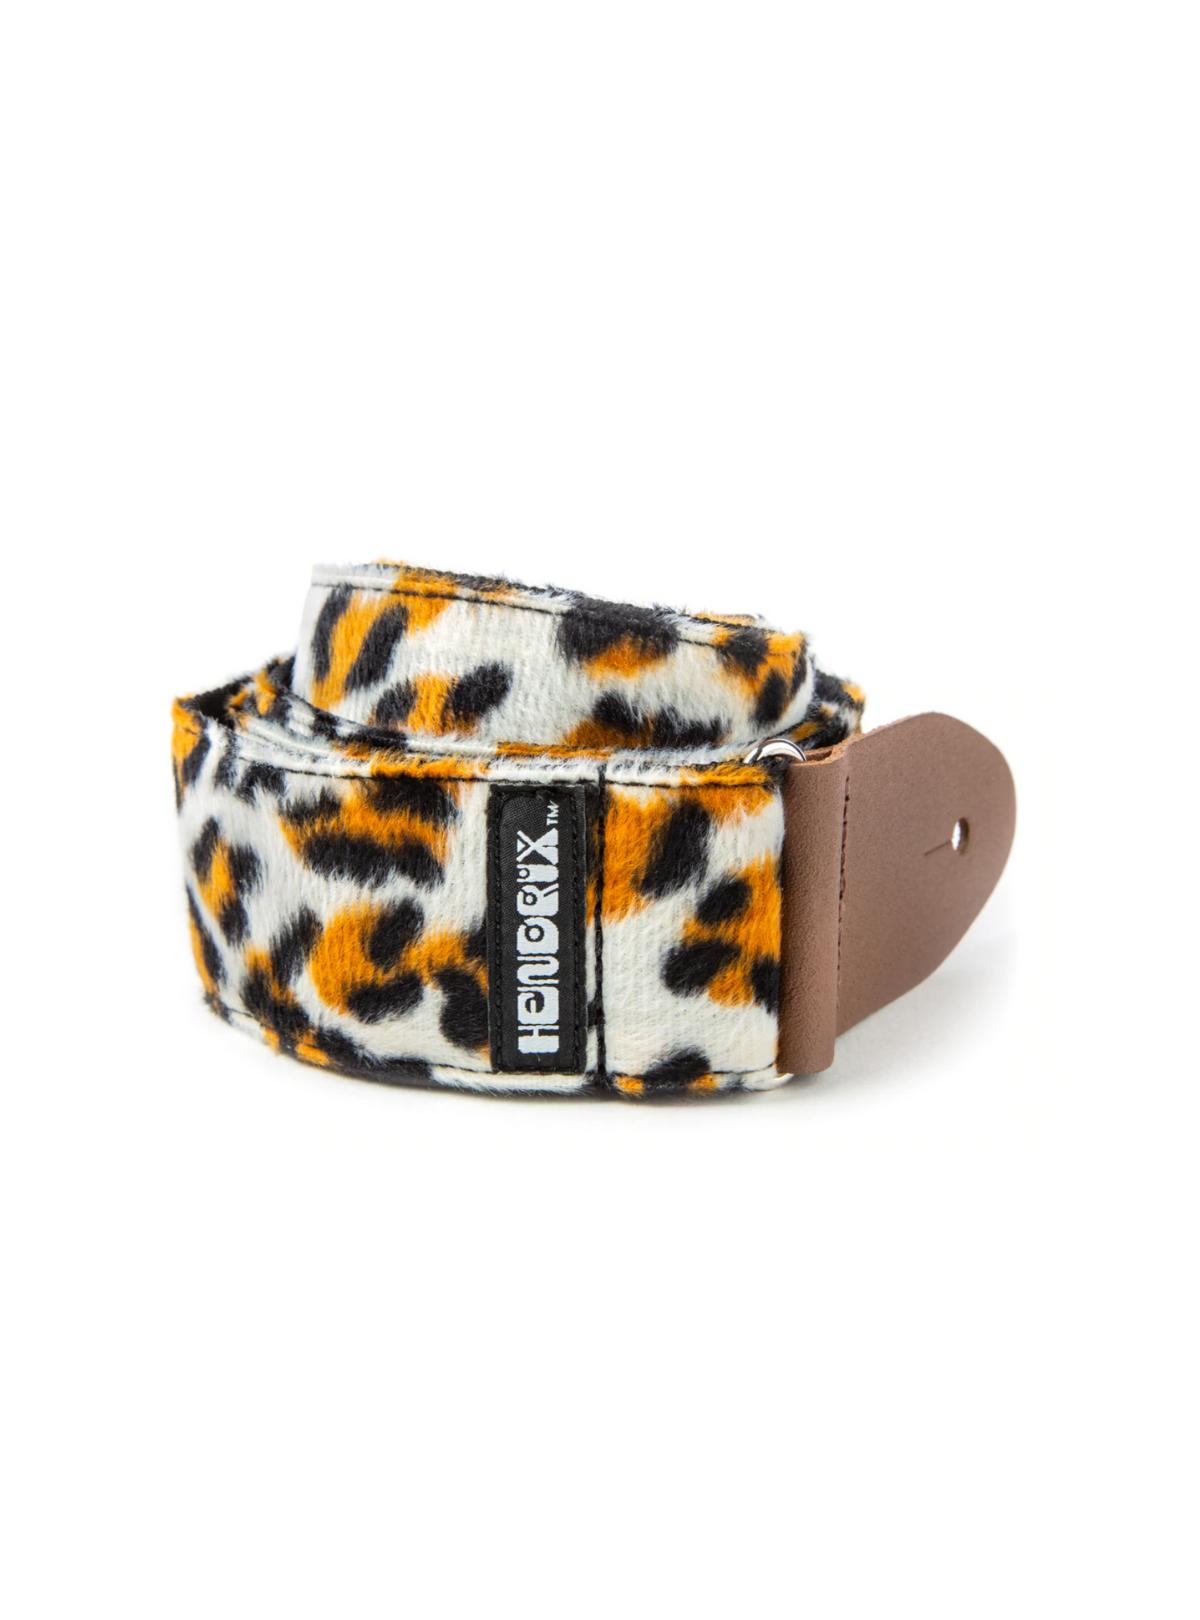 Dunlop Live in Maui Leopard Strap